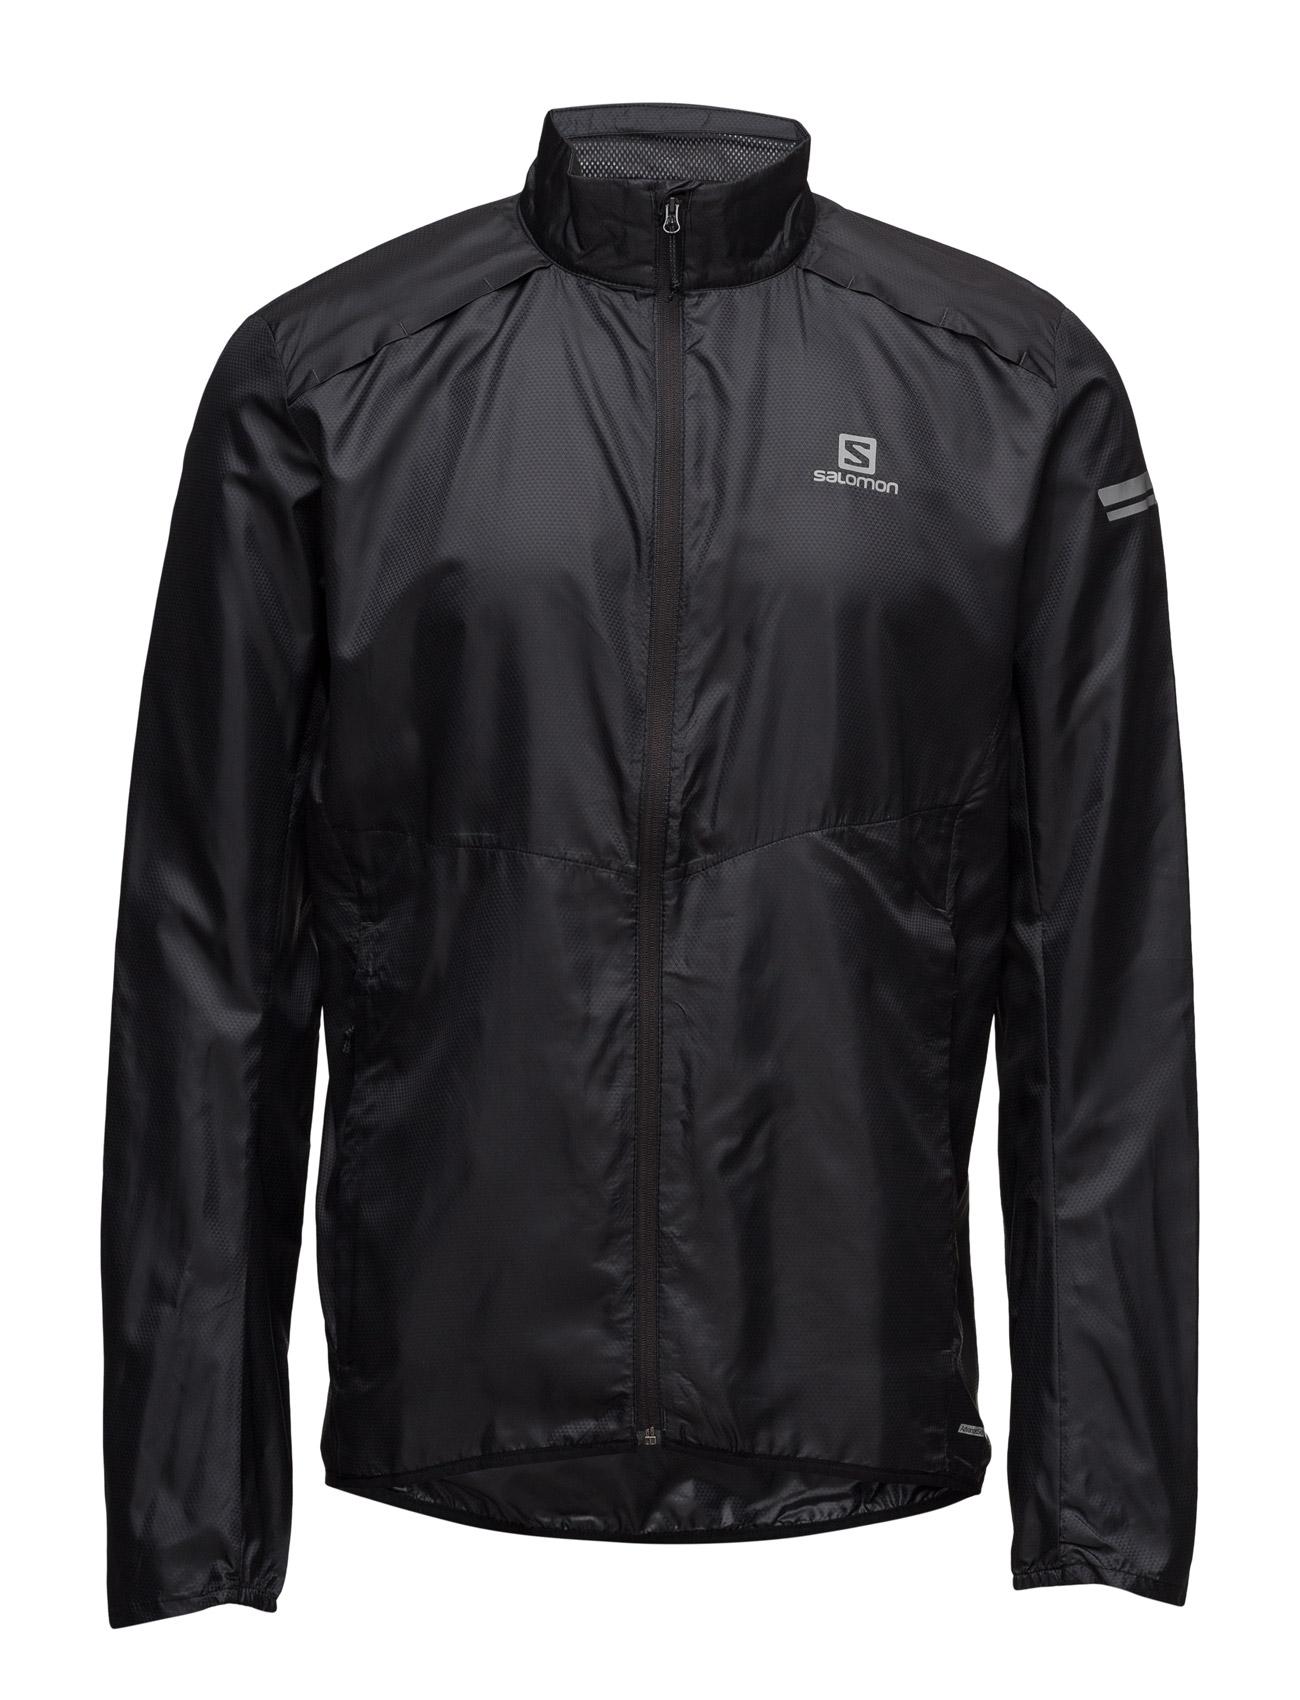 Agile jacket m fra salomon på boozt.com dk